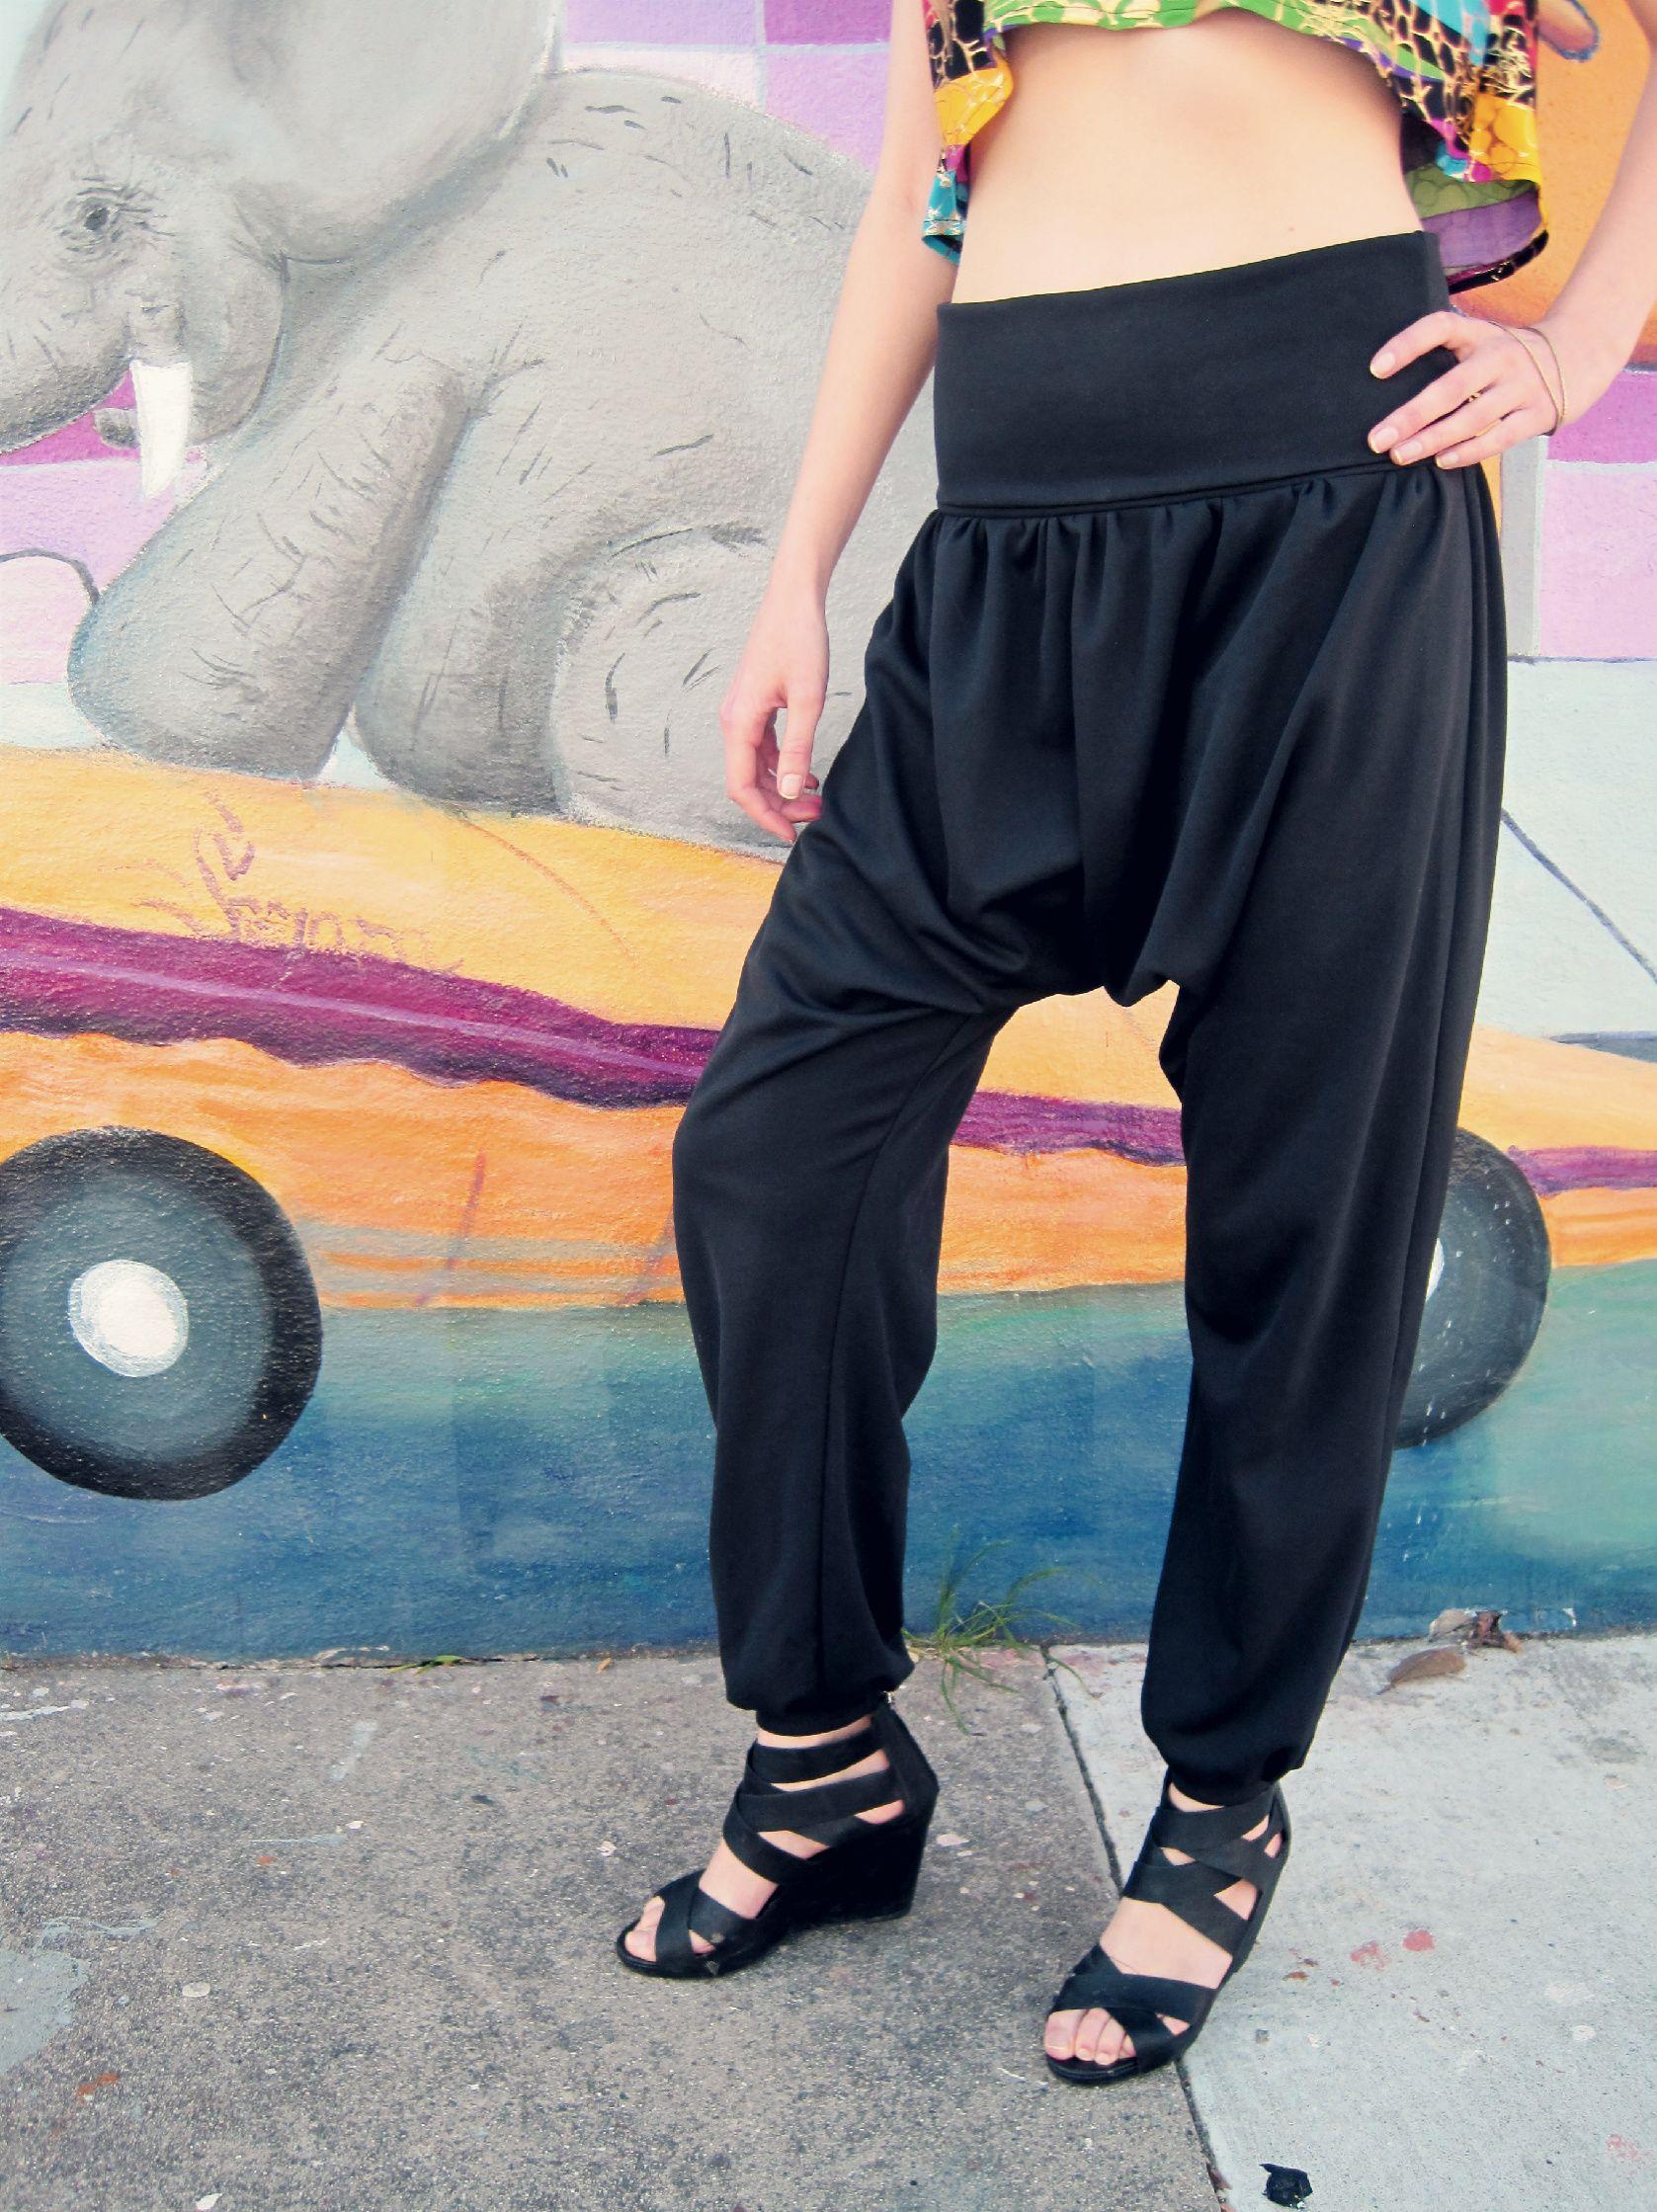 good, pantalons caiguts | CREAR COSTURA | Pinterest | Pluderhose ...